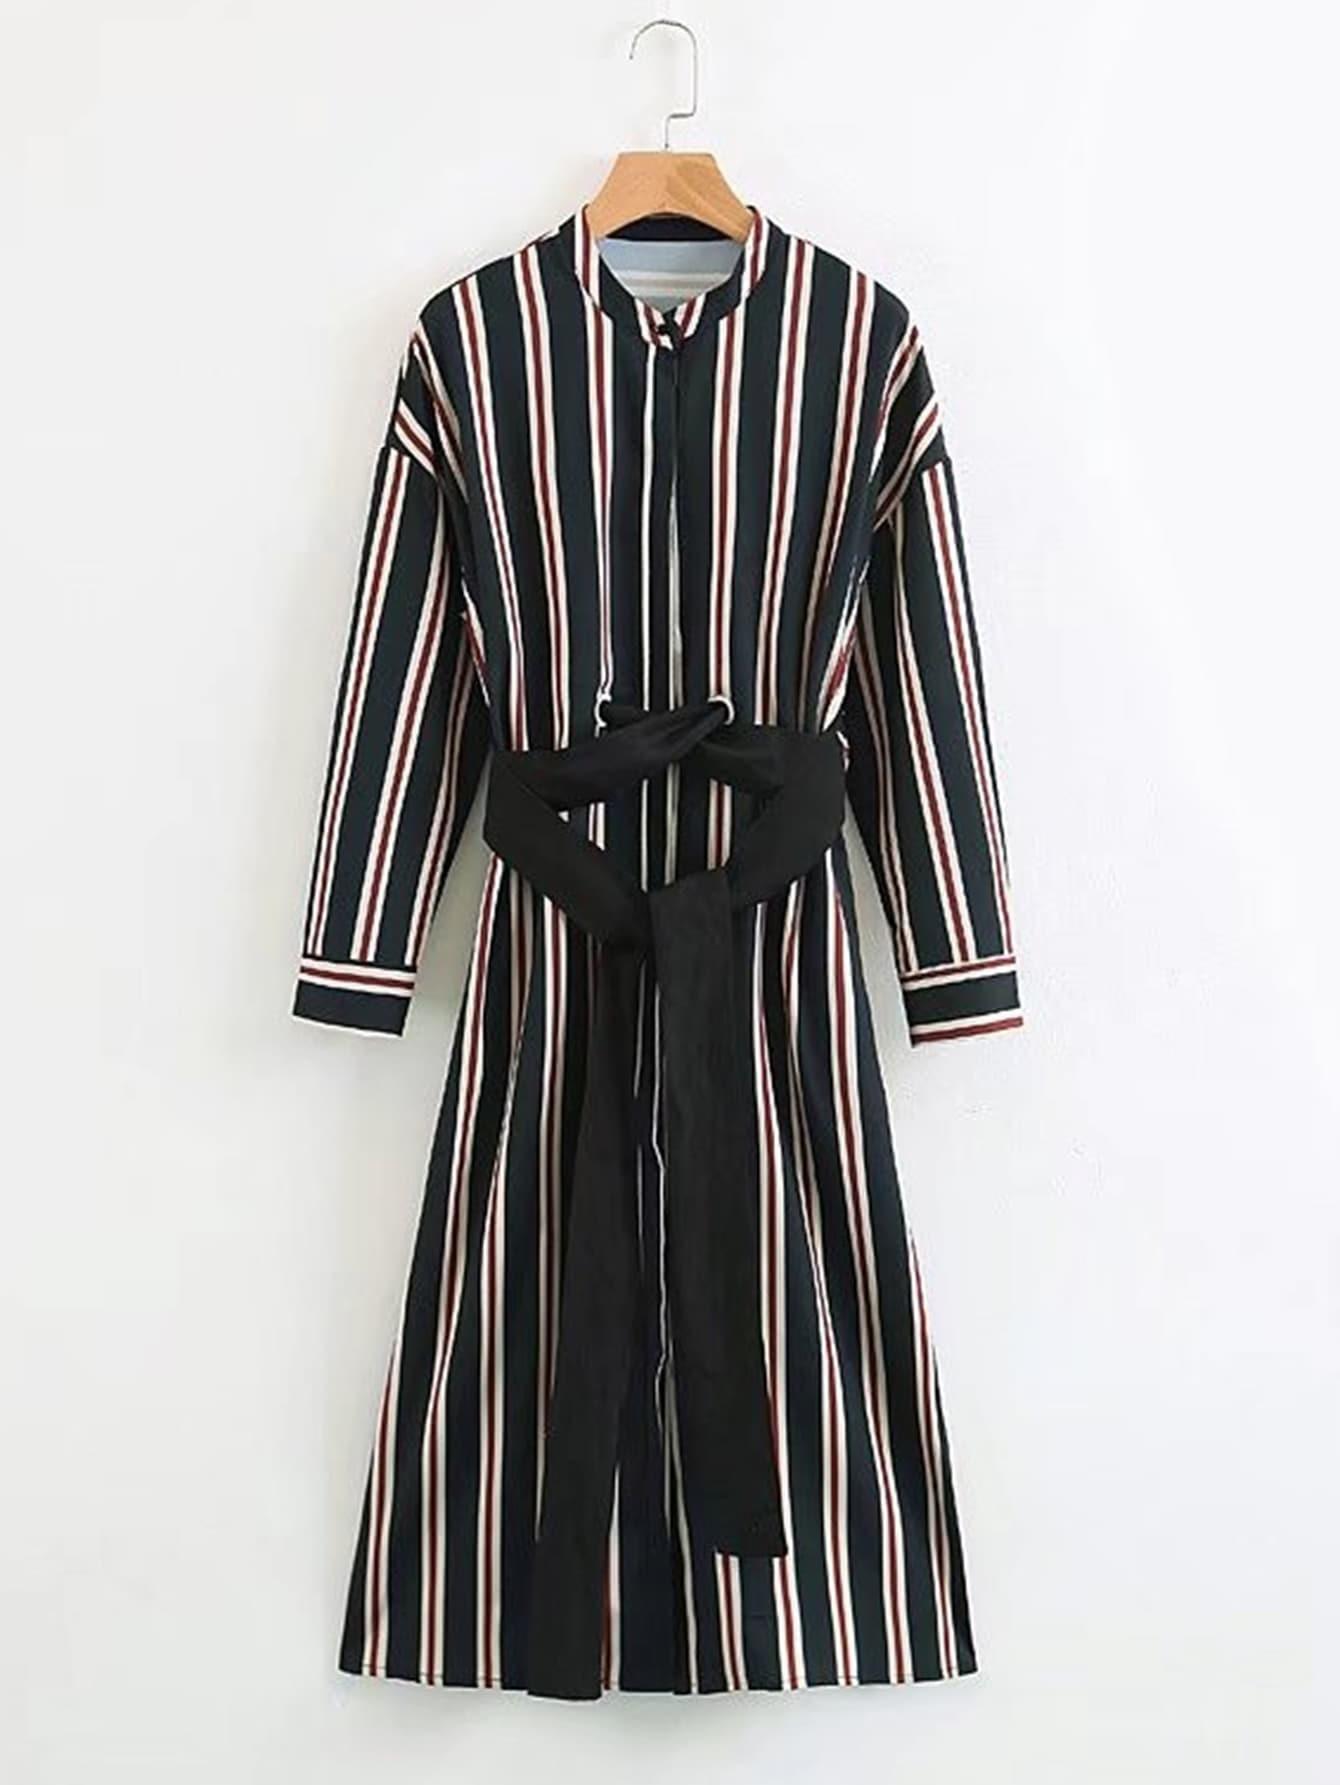 Vertical striped self tie shirt dress shein sheinside for Vertical striped dress shirt